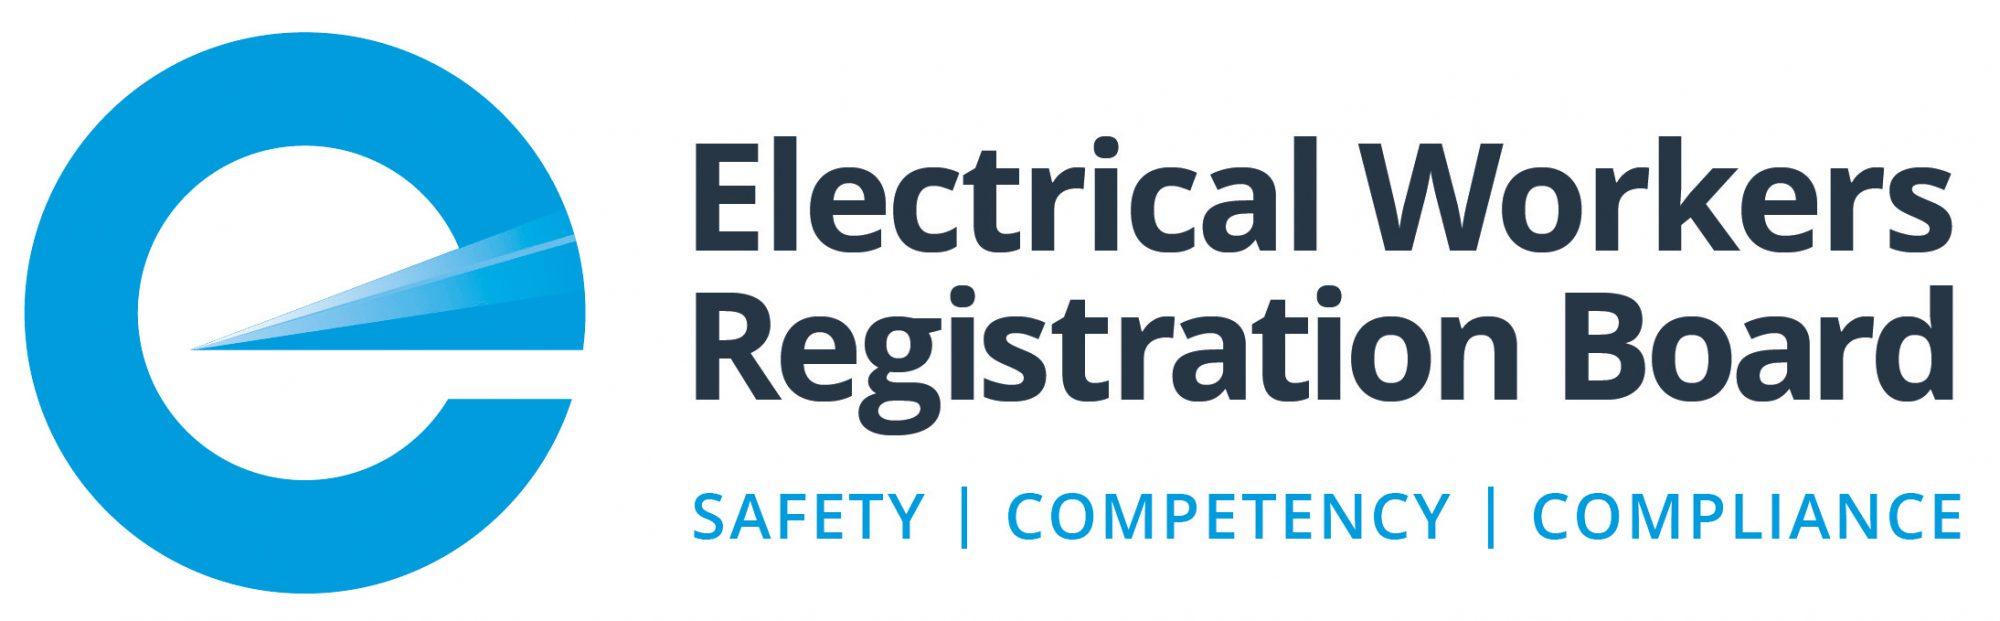 Electricity Workers Registration Board logo